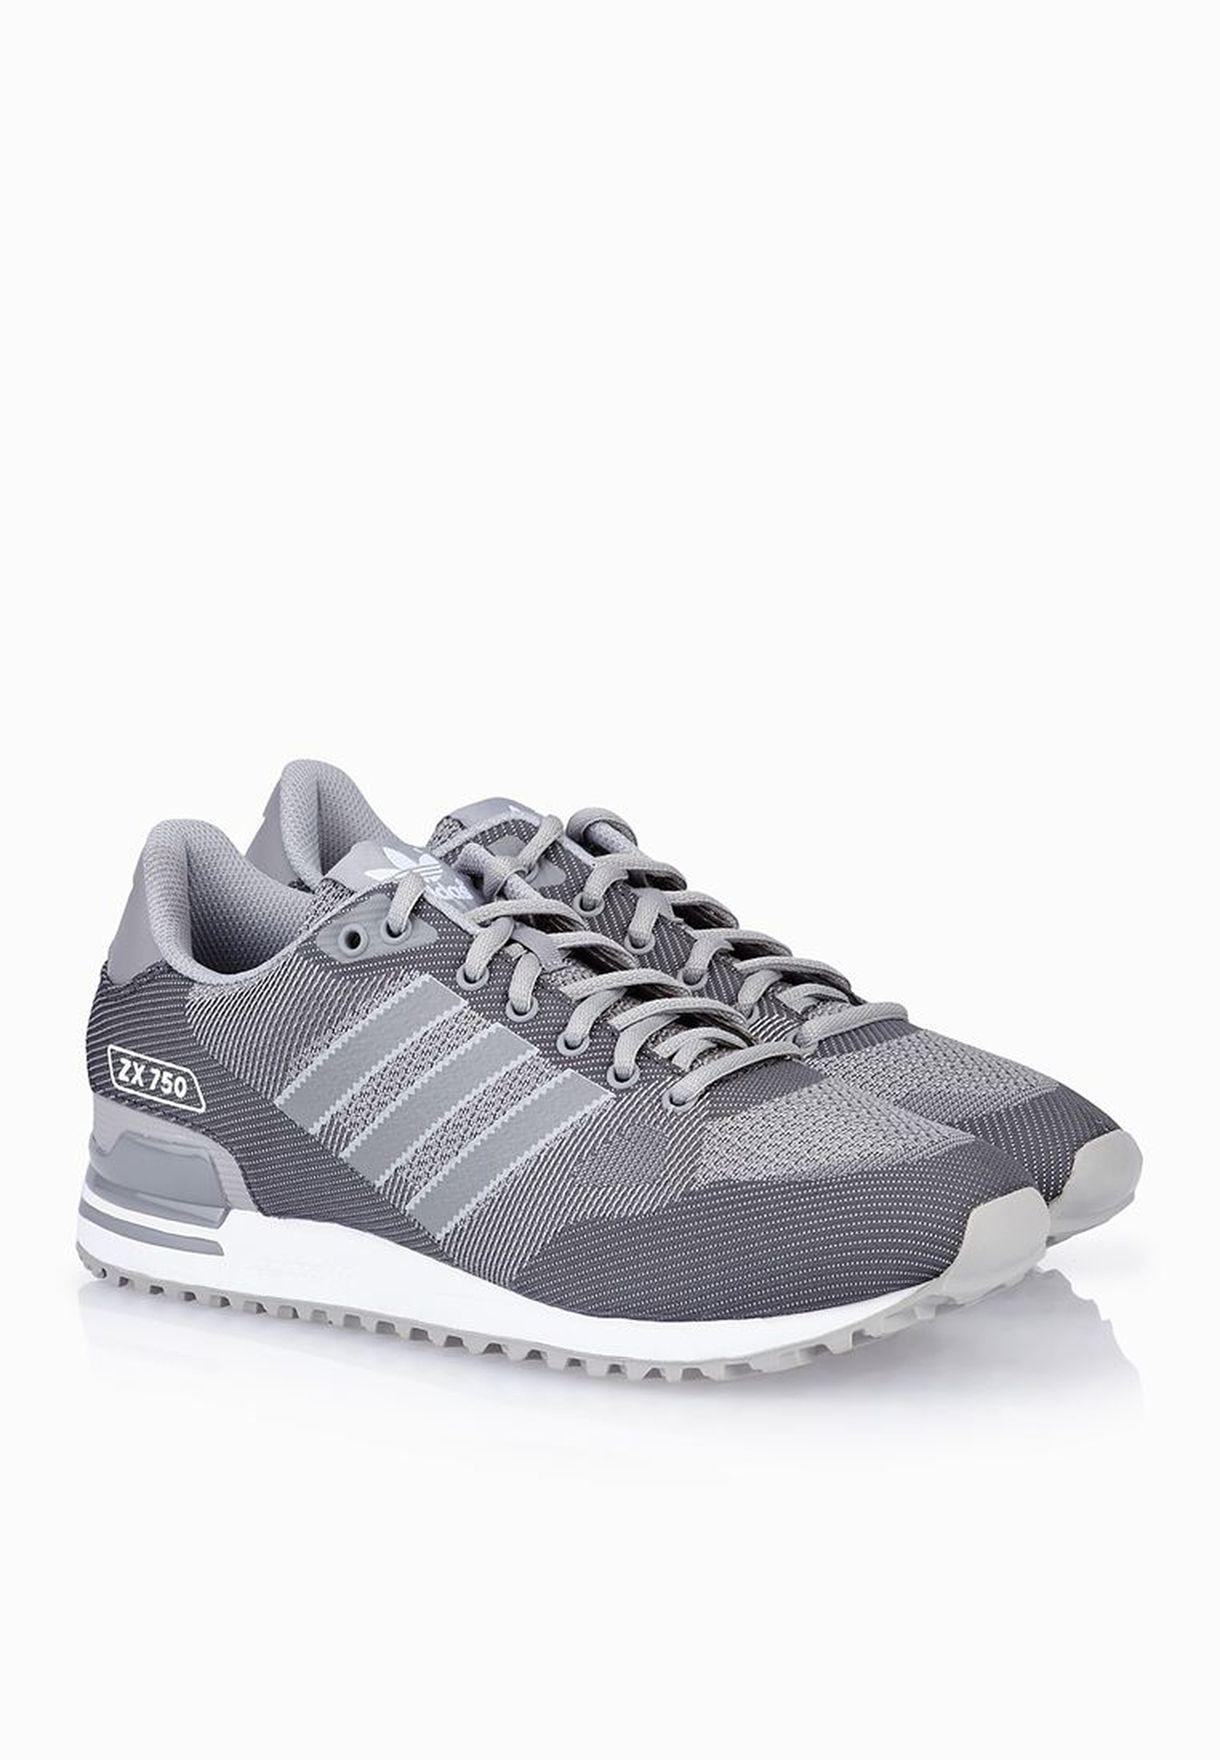 innovative design 33b60 68d9b Shop adidas Originals grey ZX 750 Weave S79196 for Men in UAE ...